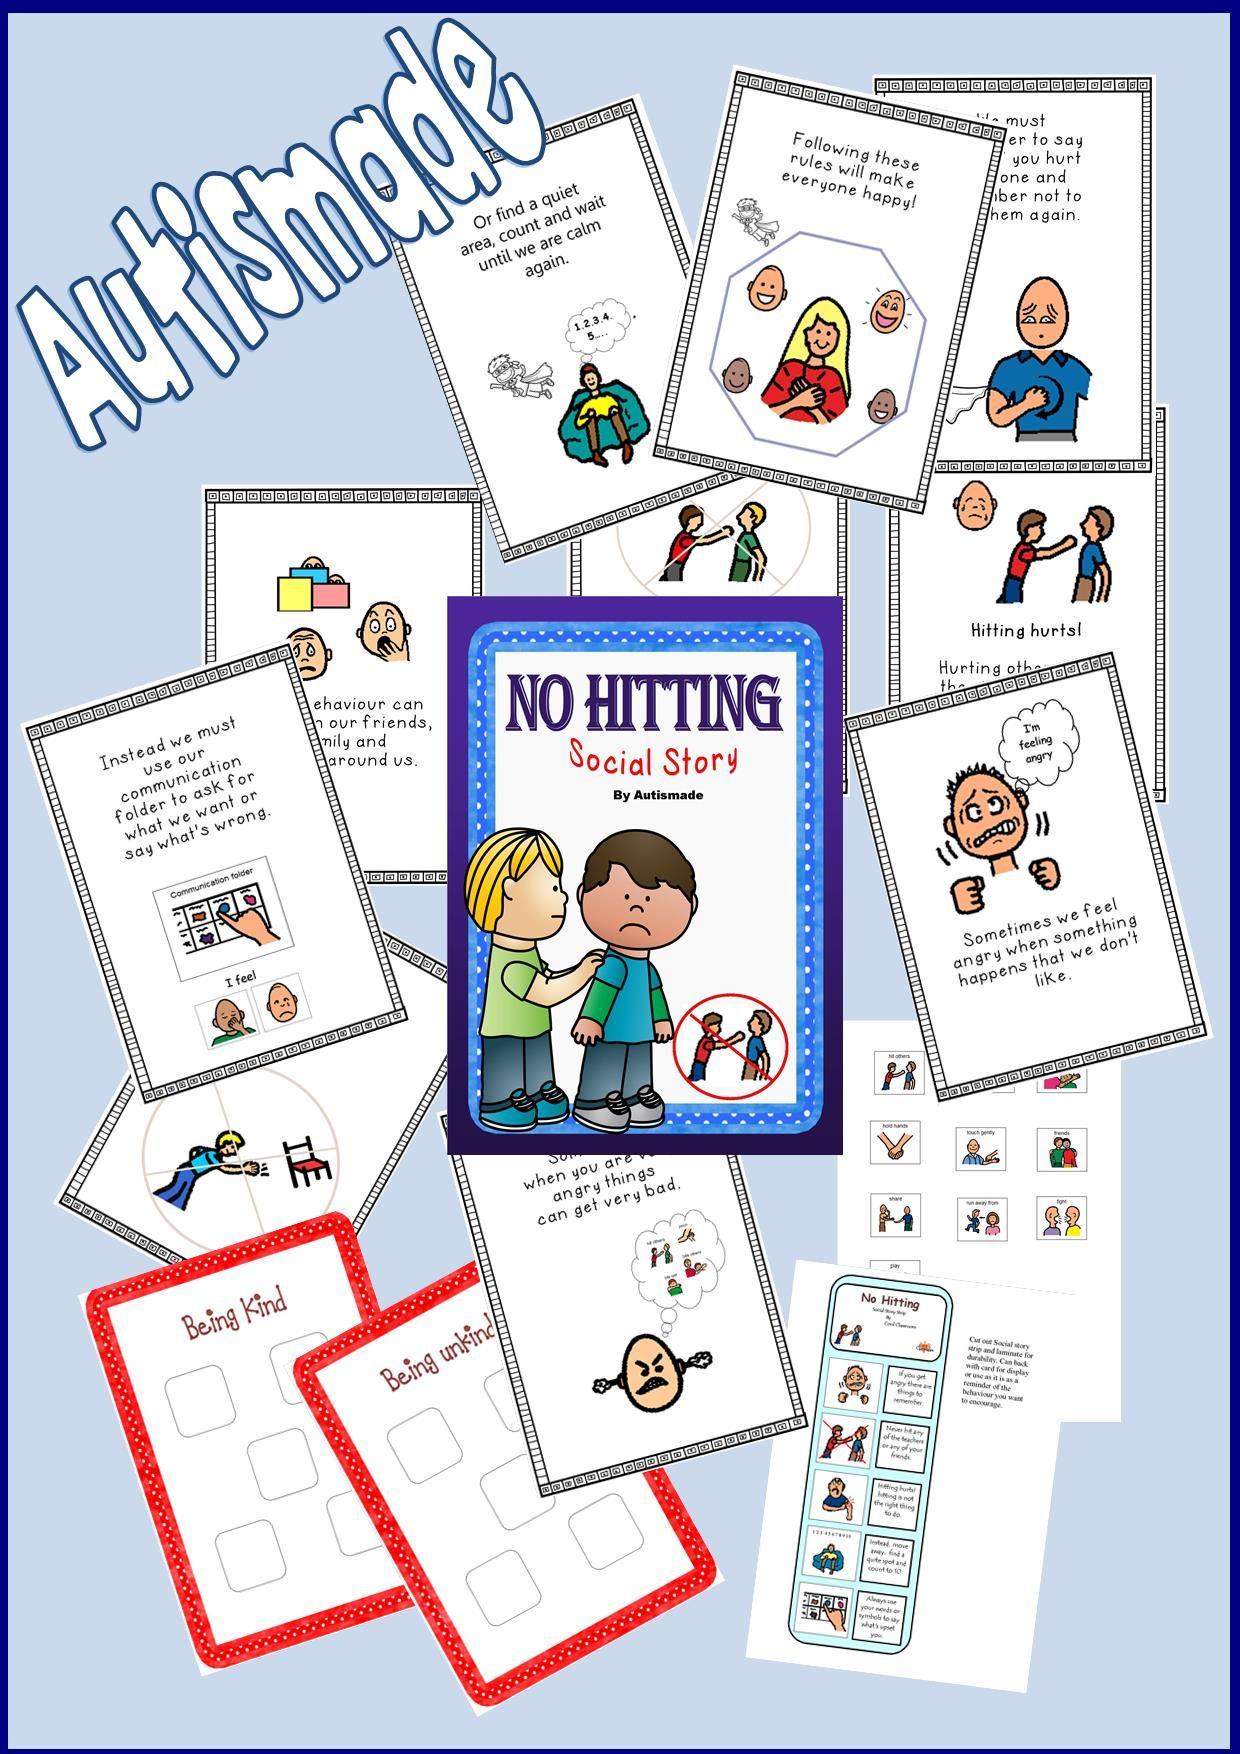 no hitting social story pdf